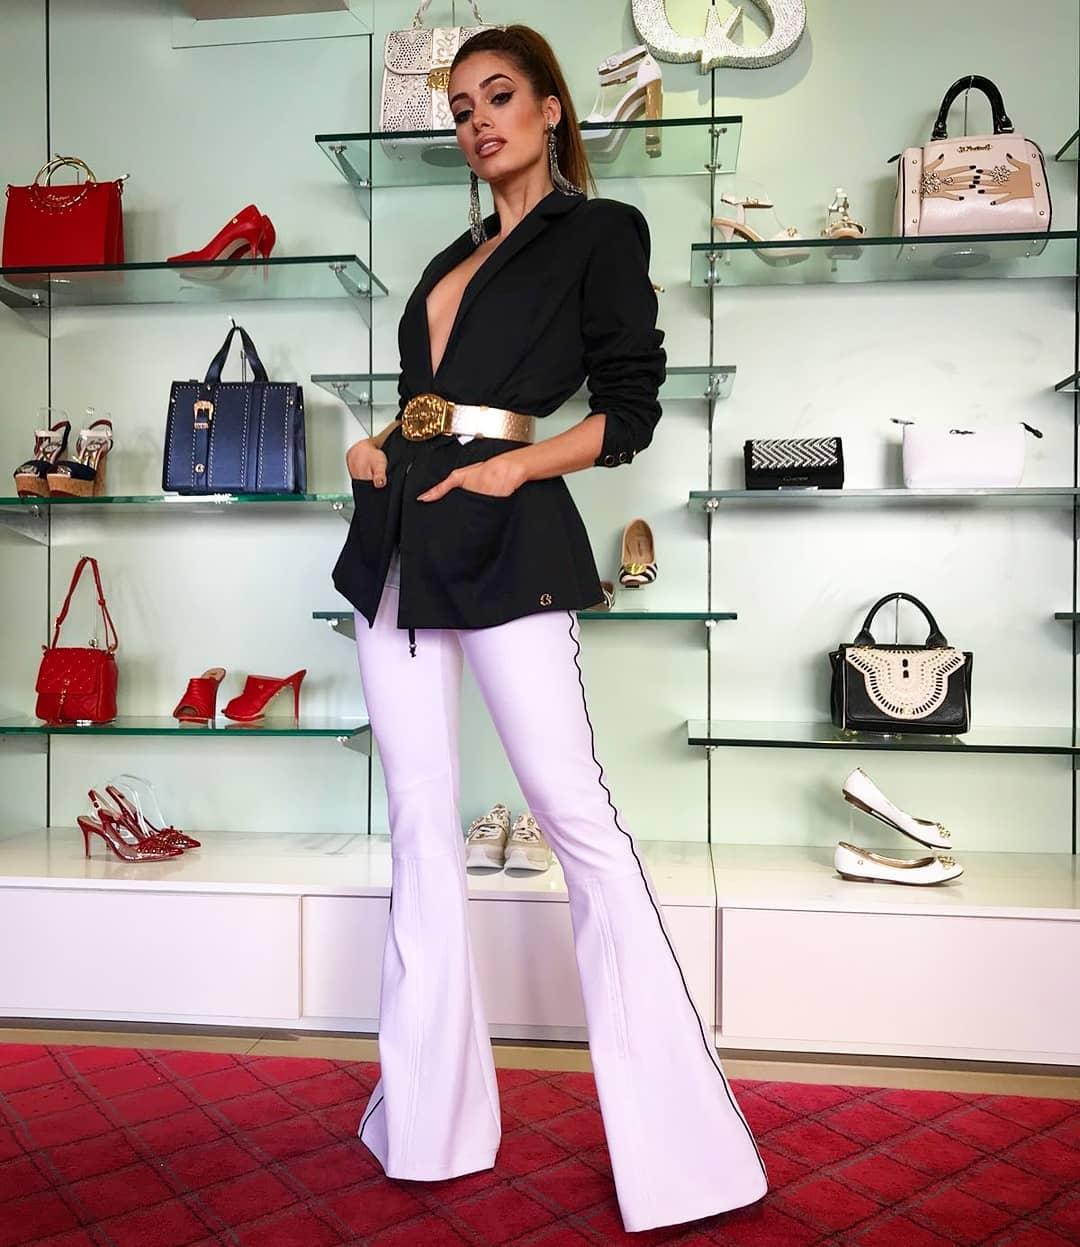 natalia gurgel, top model brasil 2021/miss morada nova 2019/miss sertao central empresarial 2018/top 20 de miss asia pacific international 2018, representando o uruguai. - Página 2 38685910